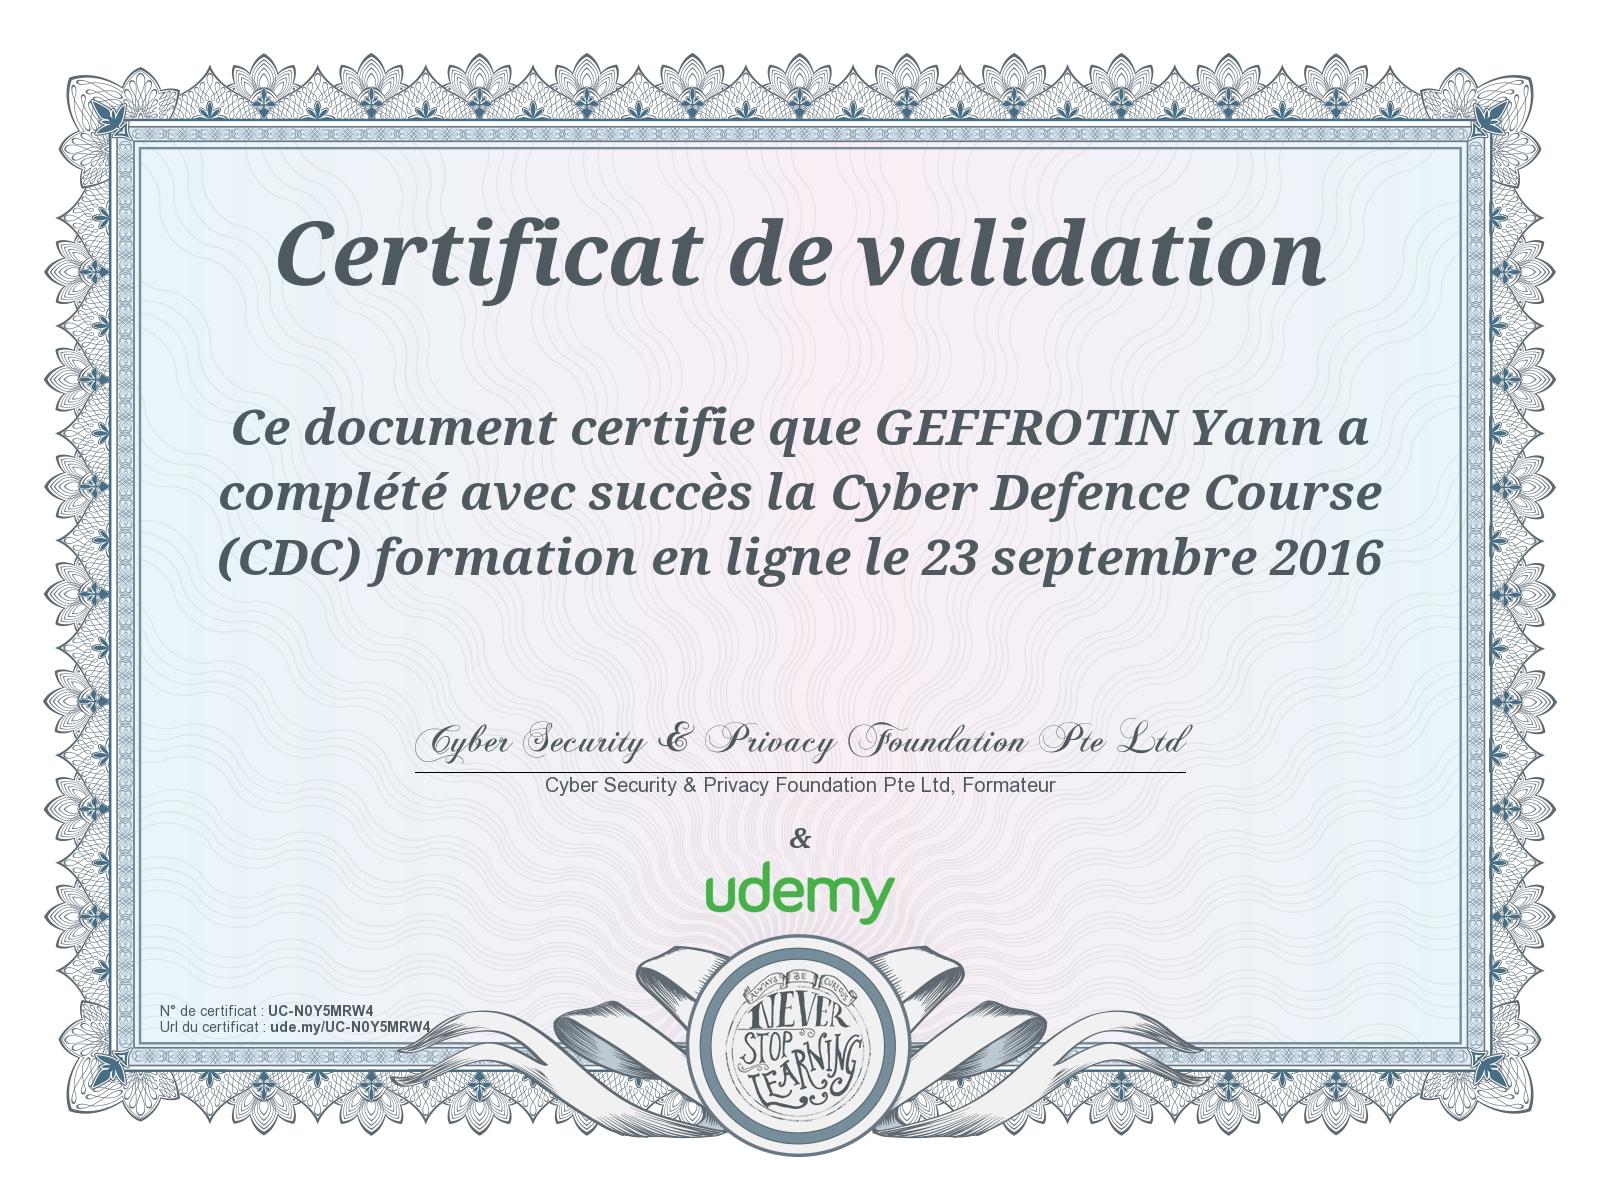 Geffrotinyann partnership for peace pfp html opencourseware cyber defense course cdc xflitez Choice Image